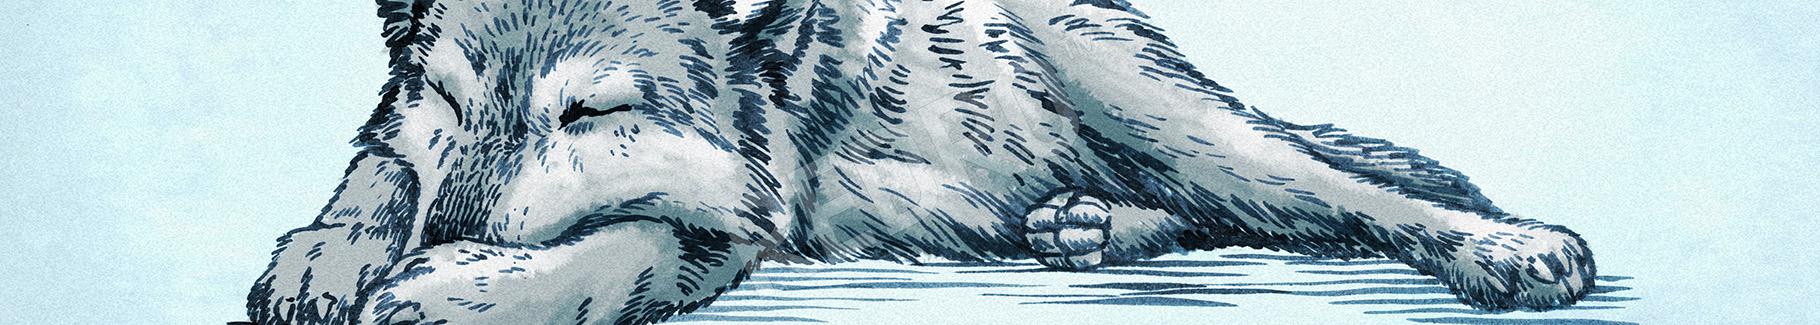 Obraz rysunek wilka